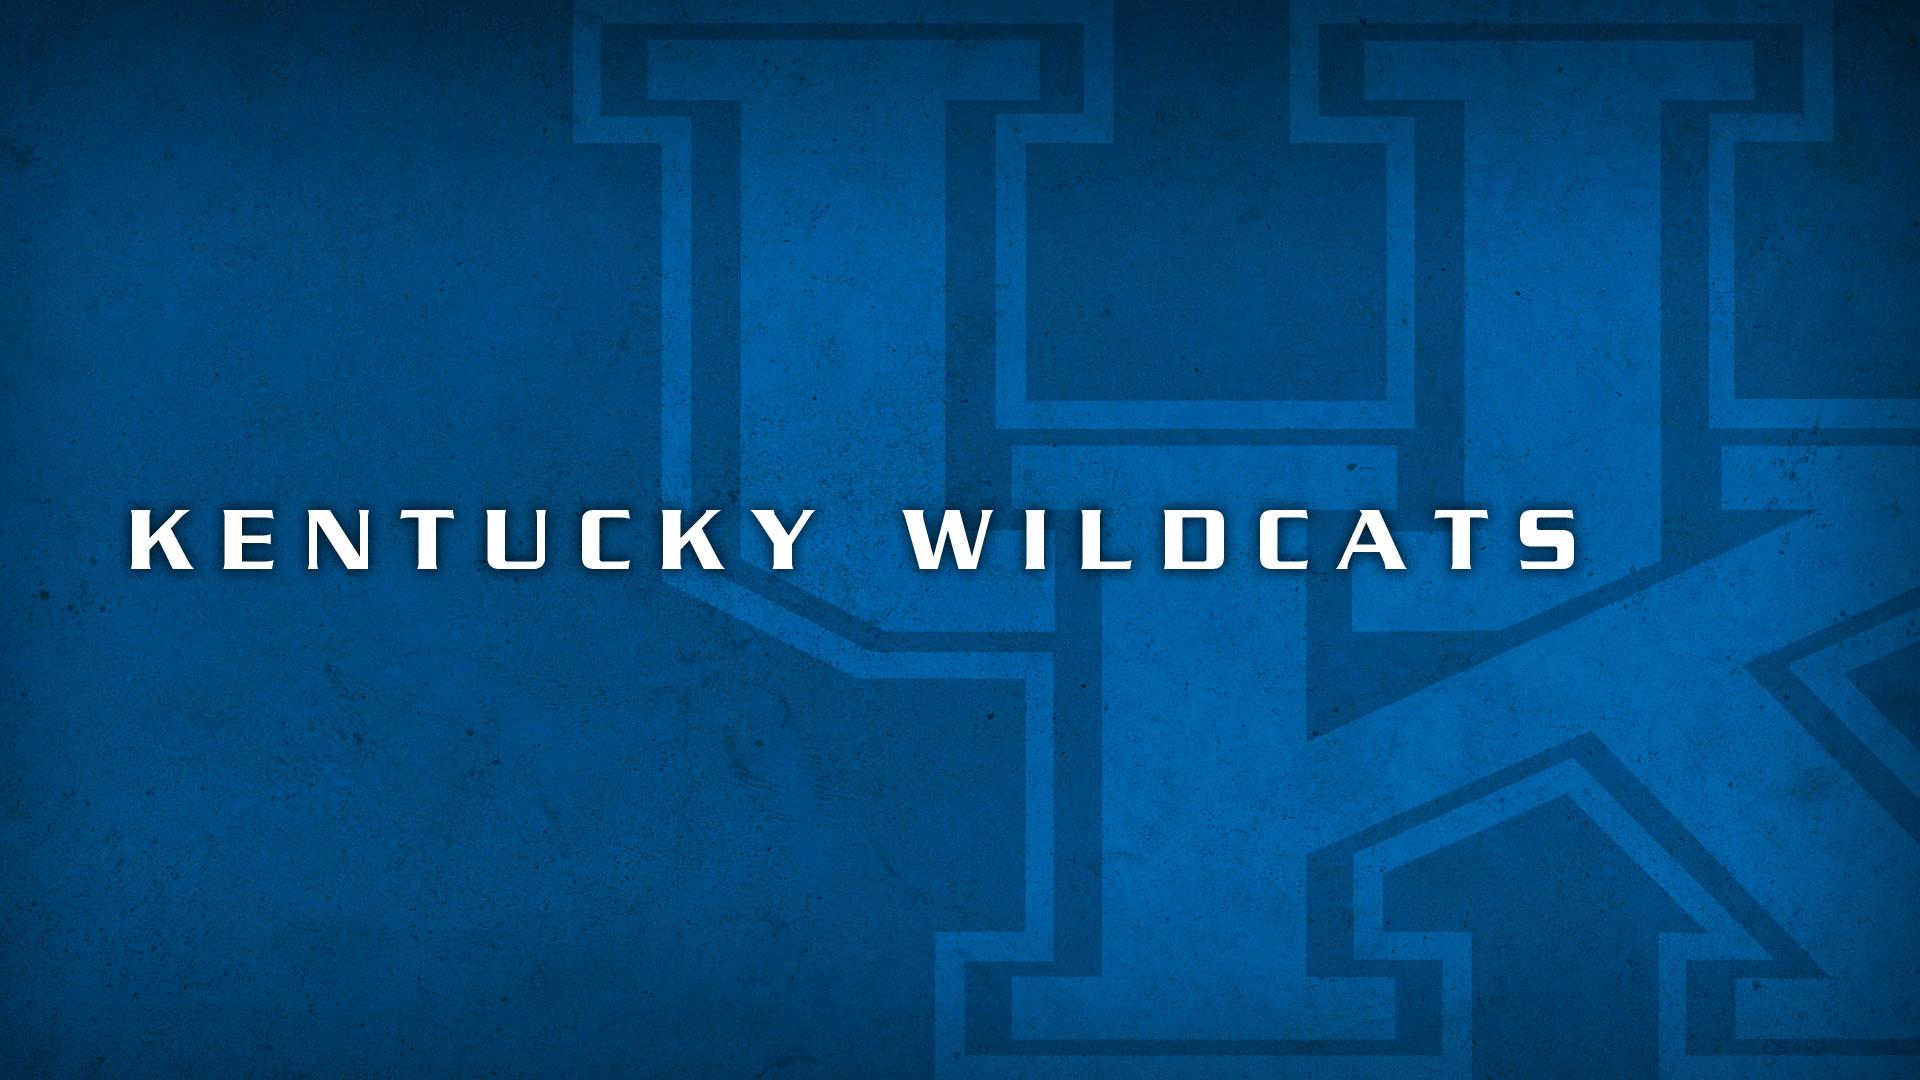 48 University Of Kentucky Desktop Wallpaper On Wallpapersafari